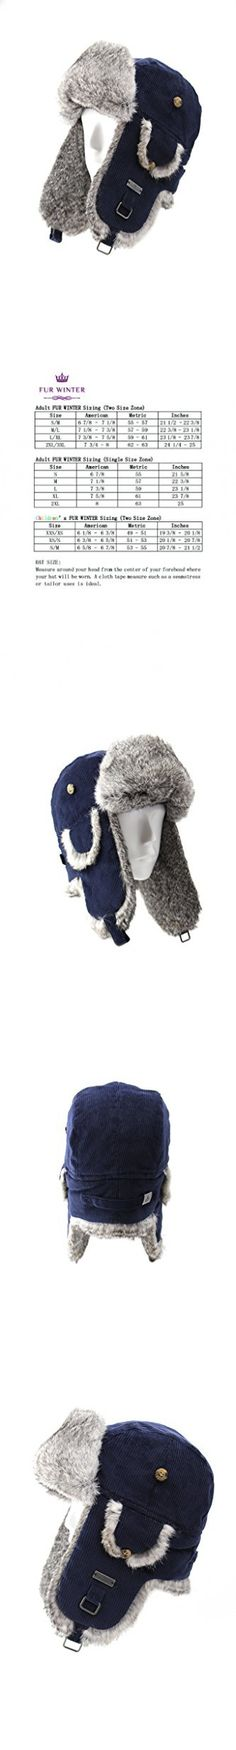 FUR WINTER Cotton Corduroy Rabbit Fur Aviator Bomber Trapper Hat DBL L/XL